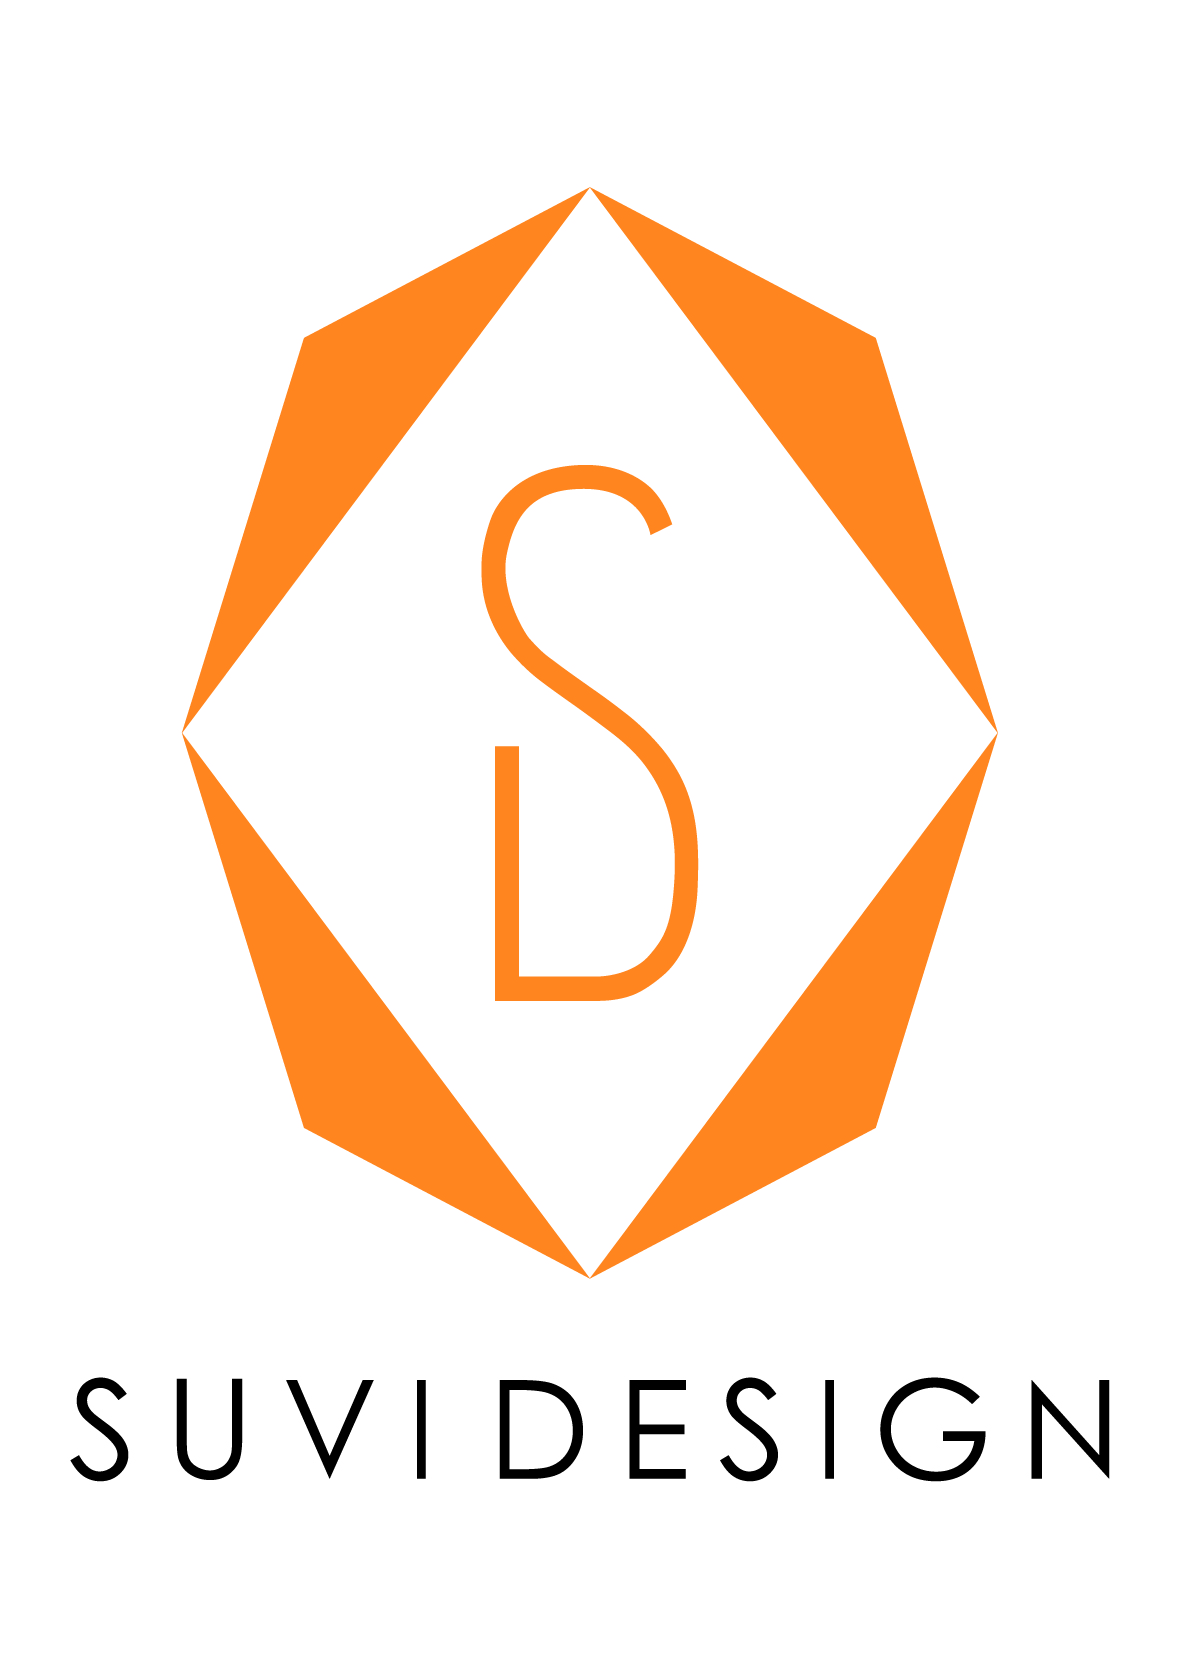 SuviDesign logo (jpg)